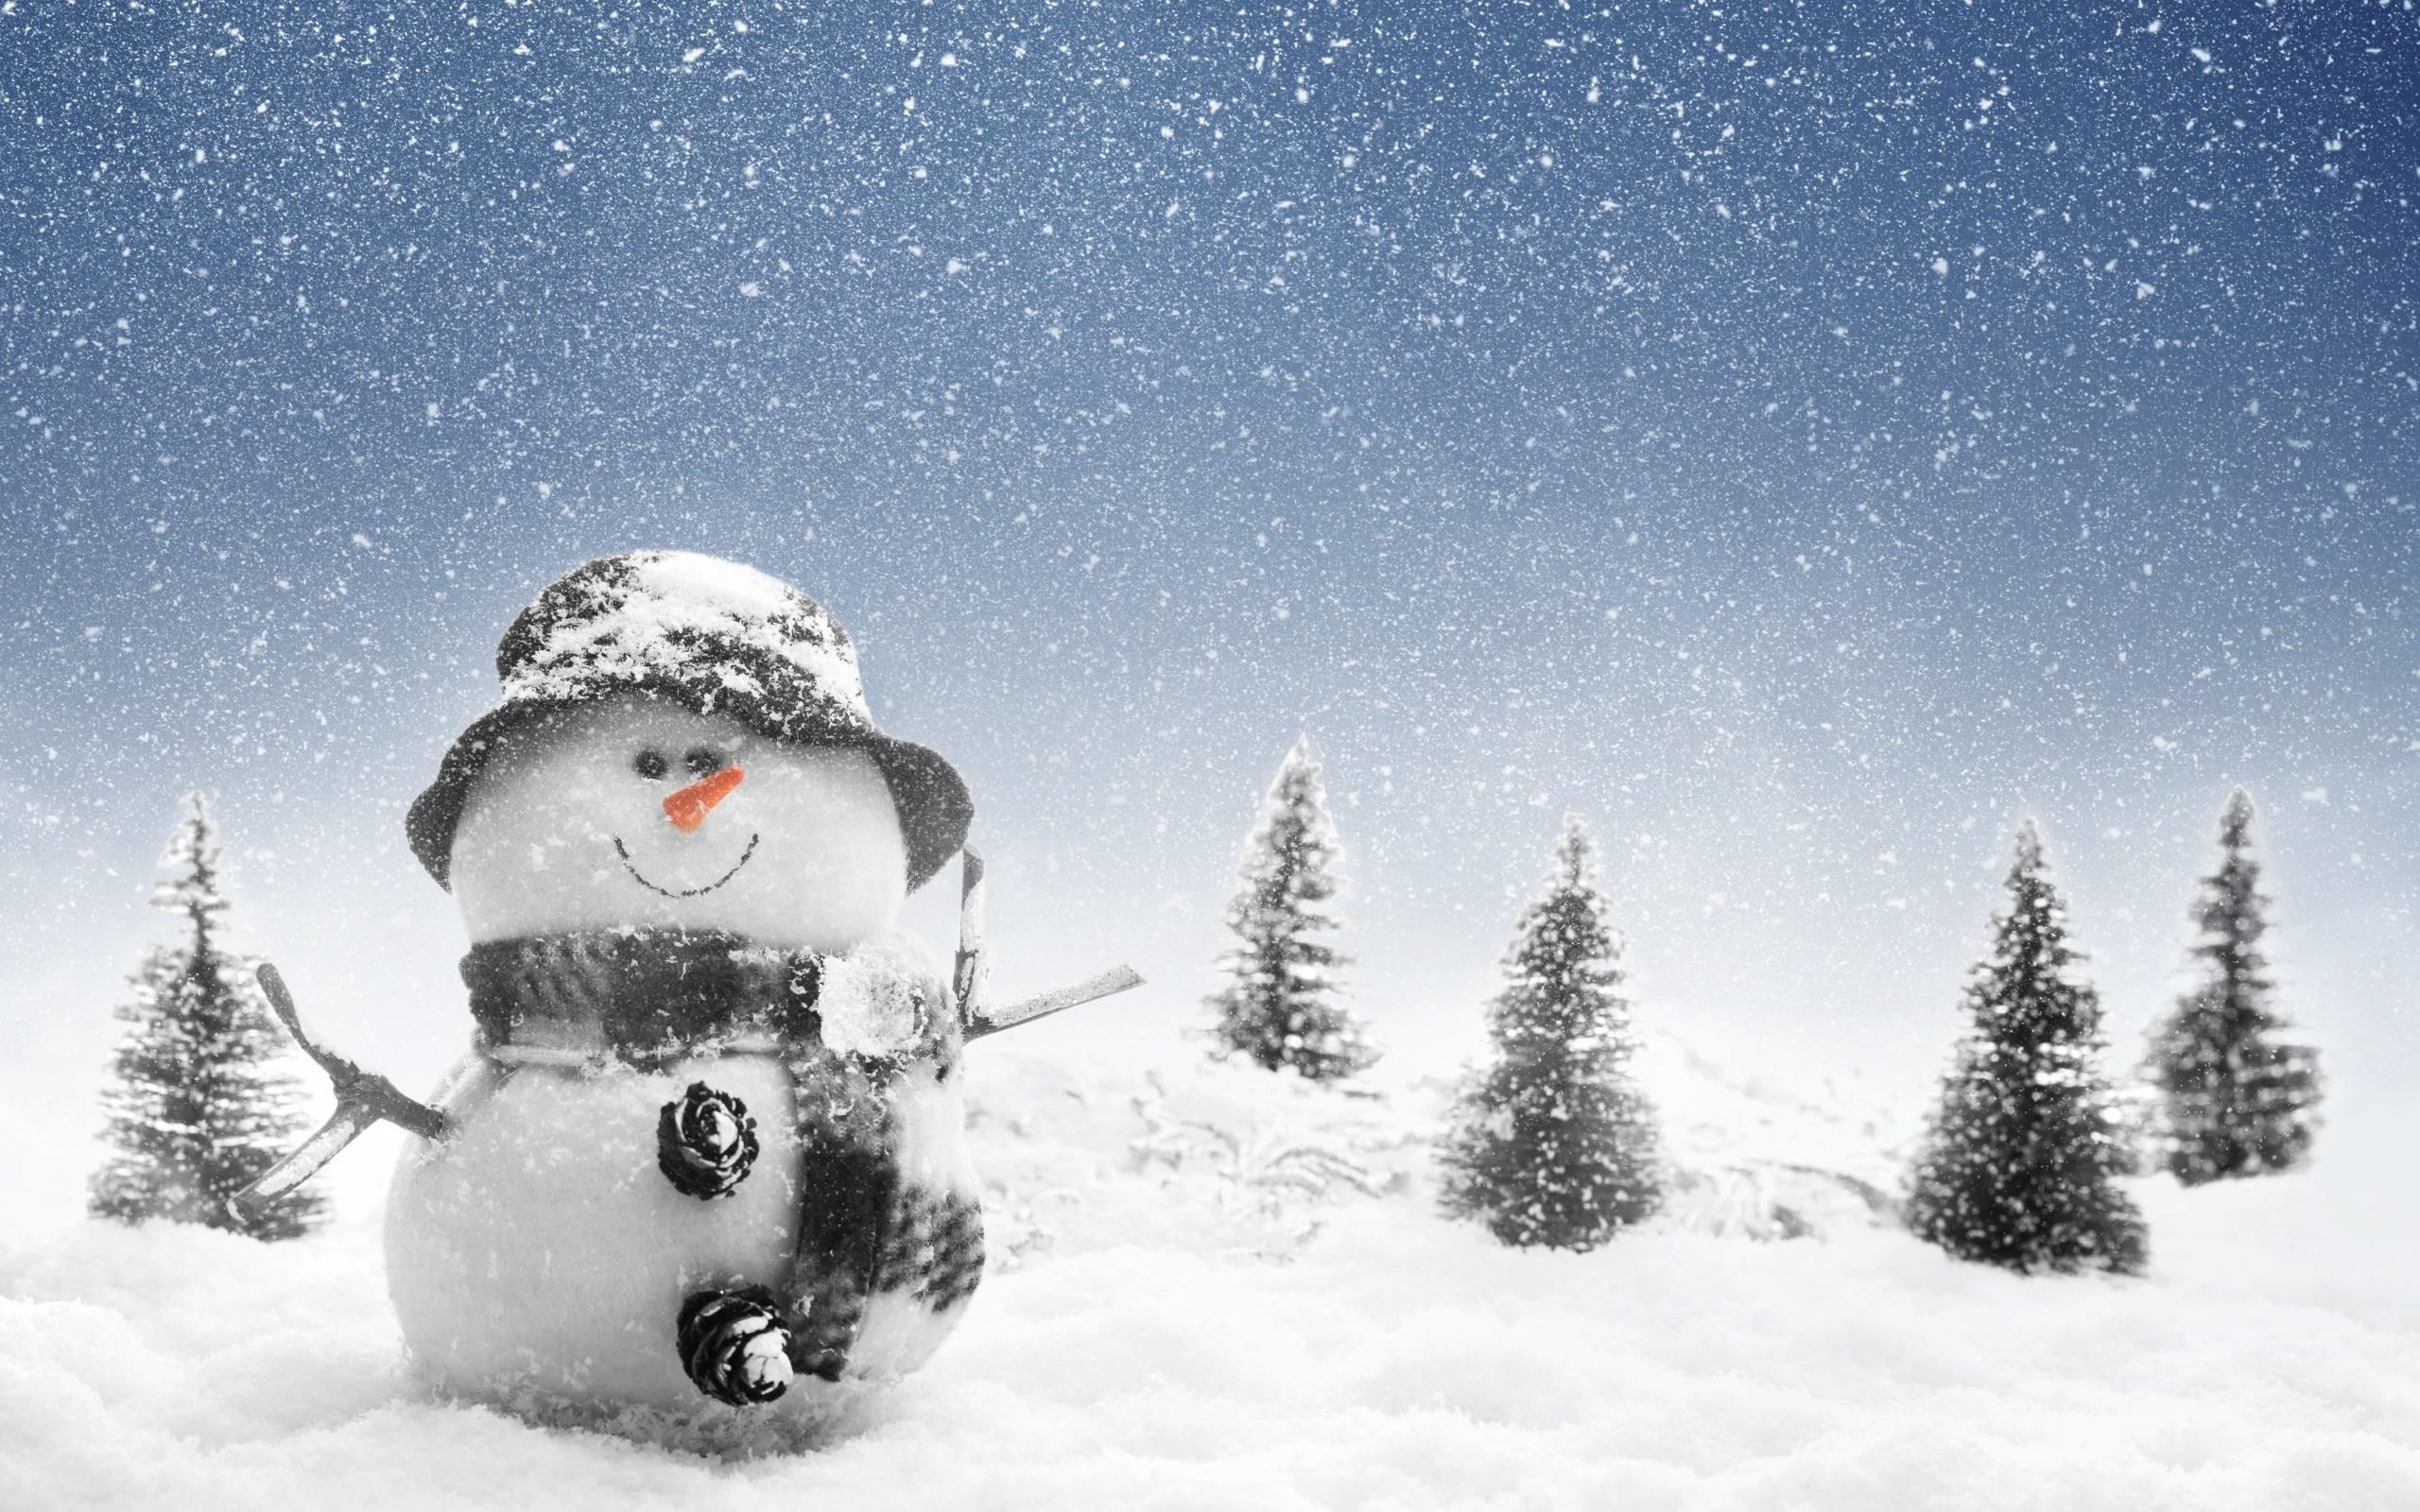 winter snowman wallpaper (61+ images)